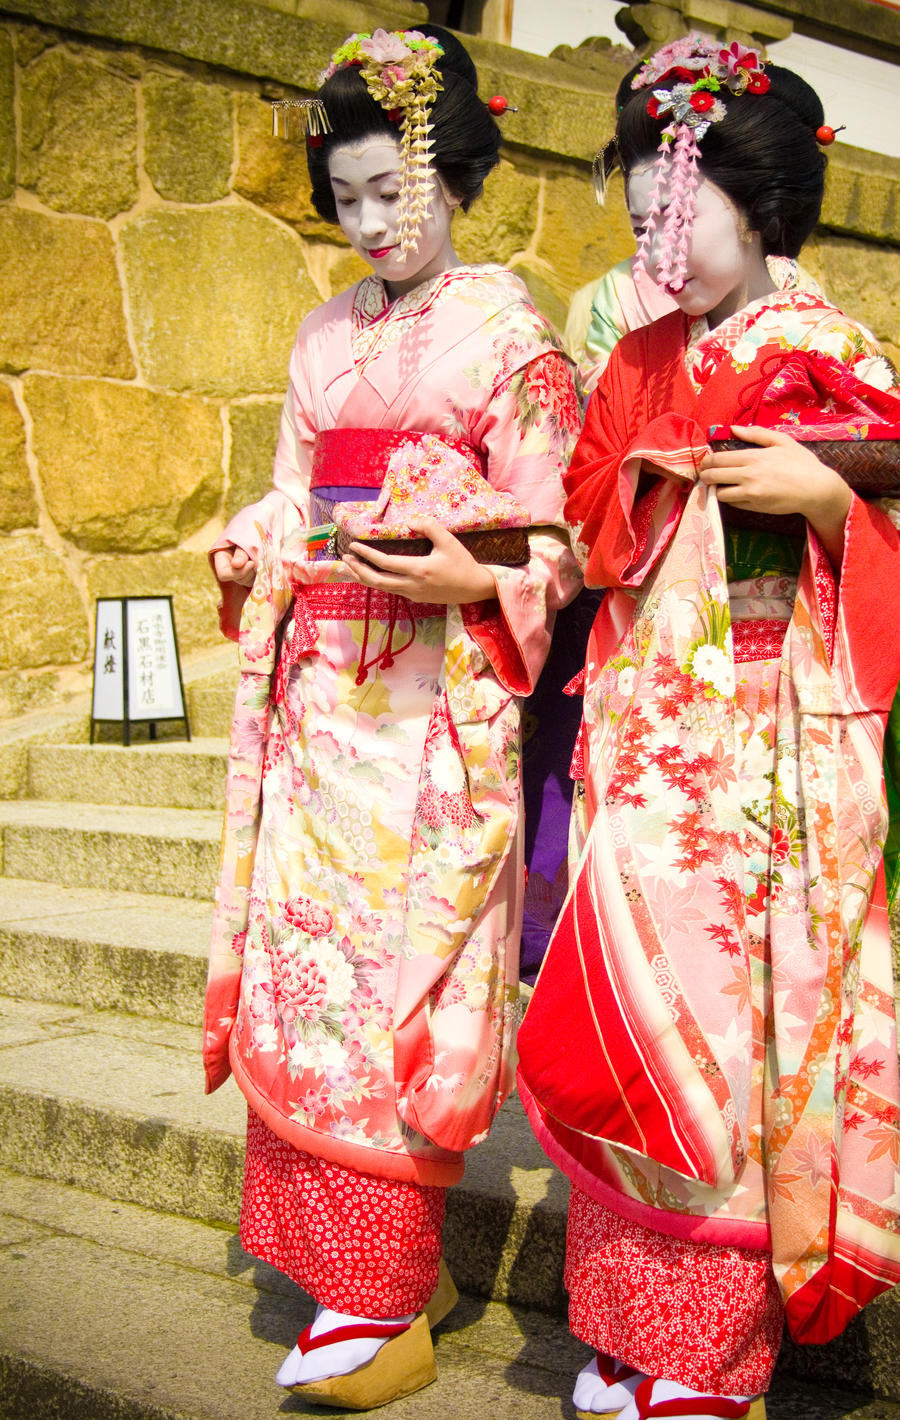 Geishas 3 by rachelarandilla